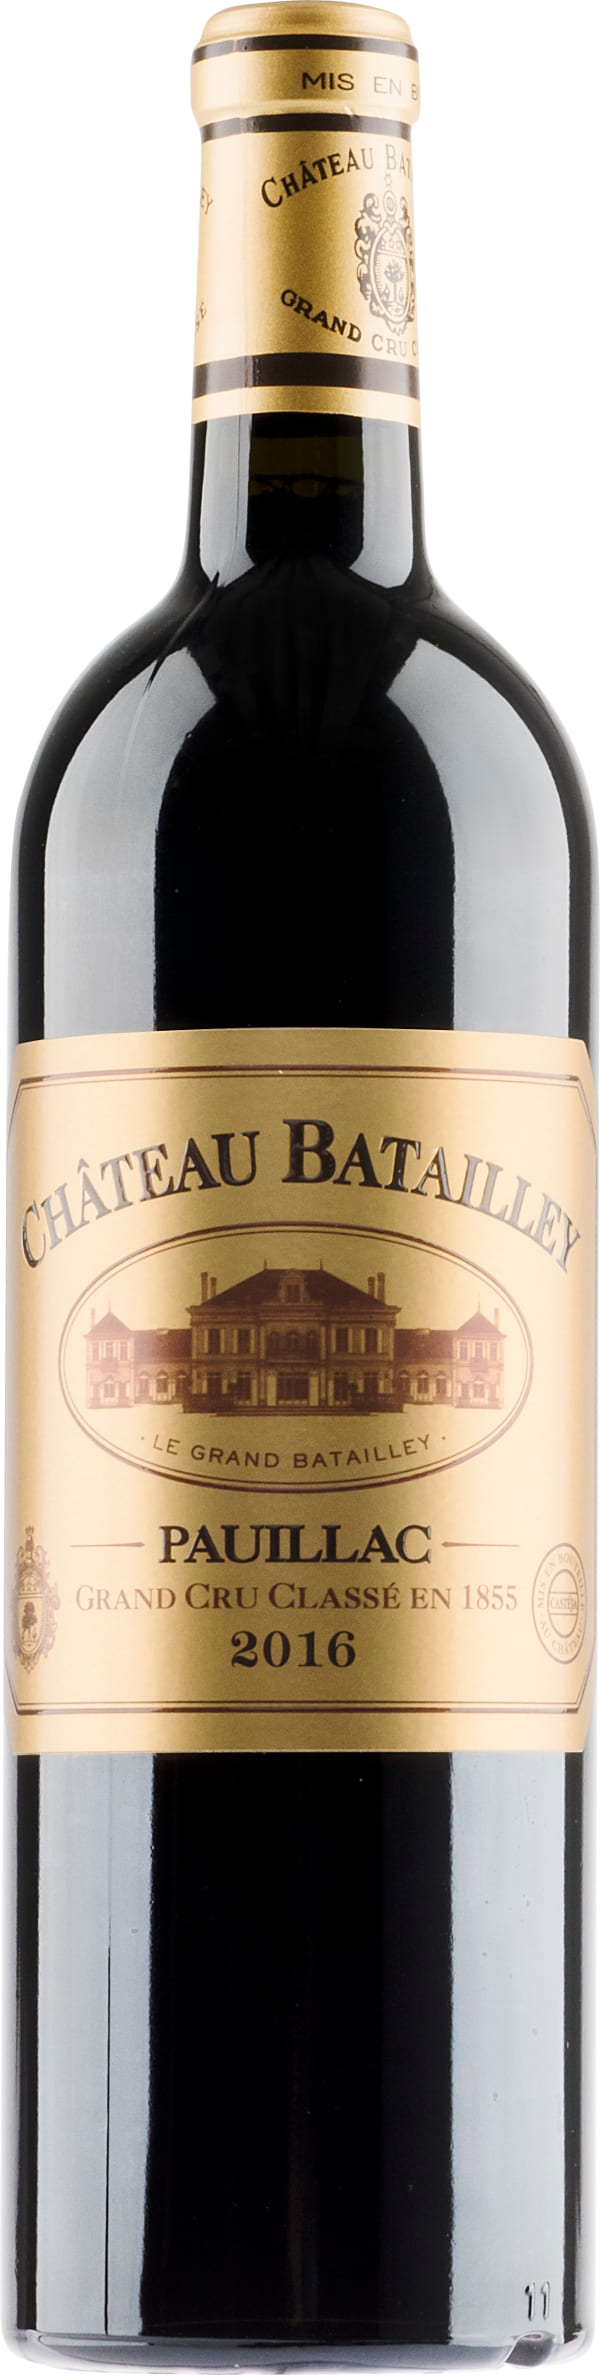 Château Batailley 2016